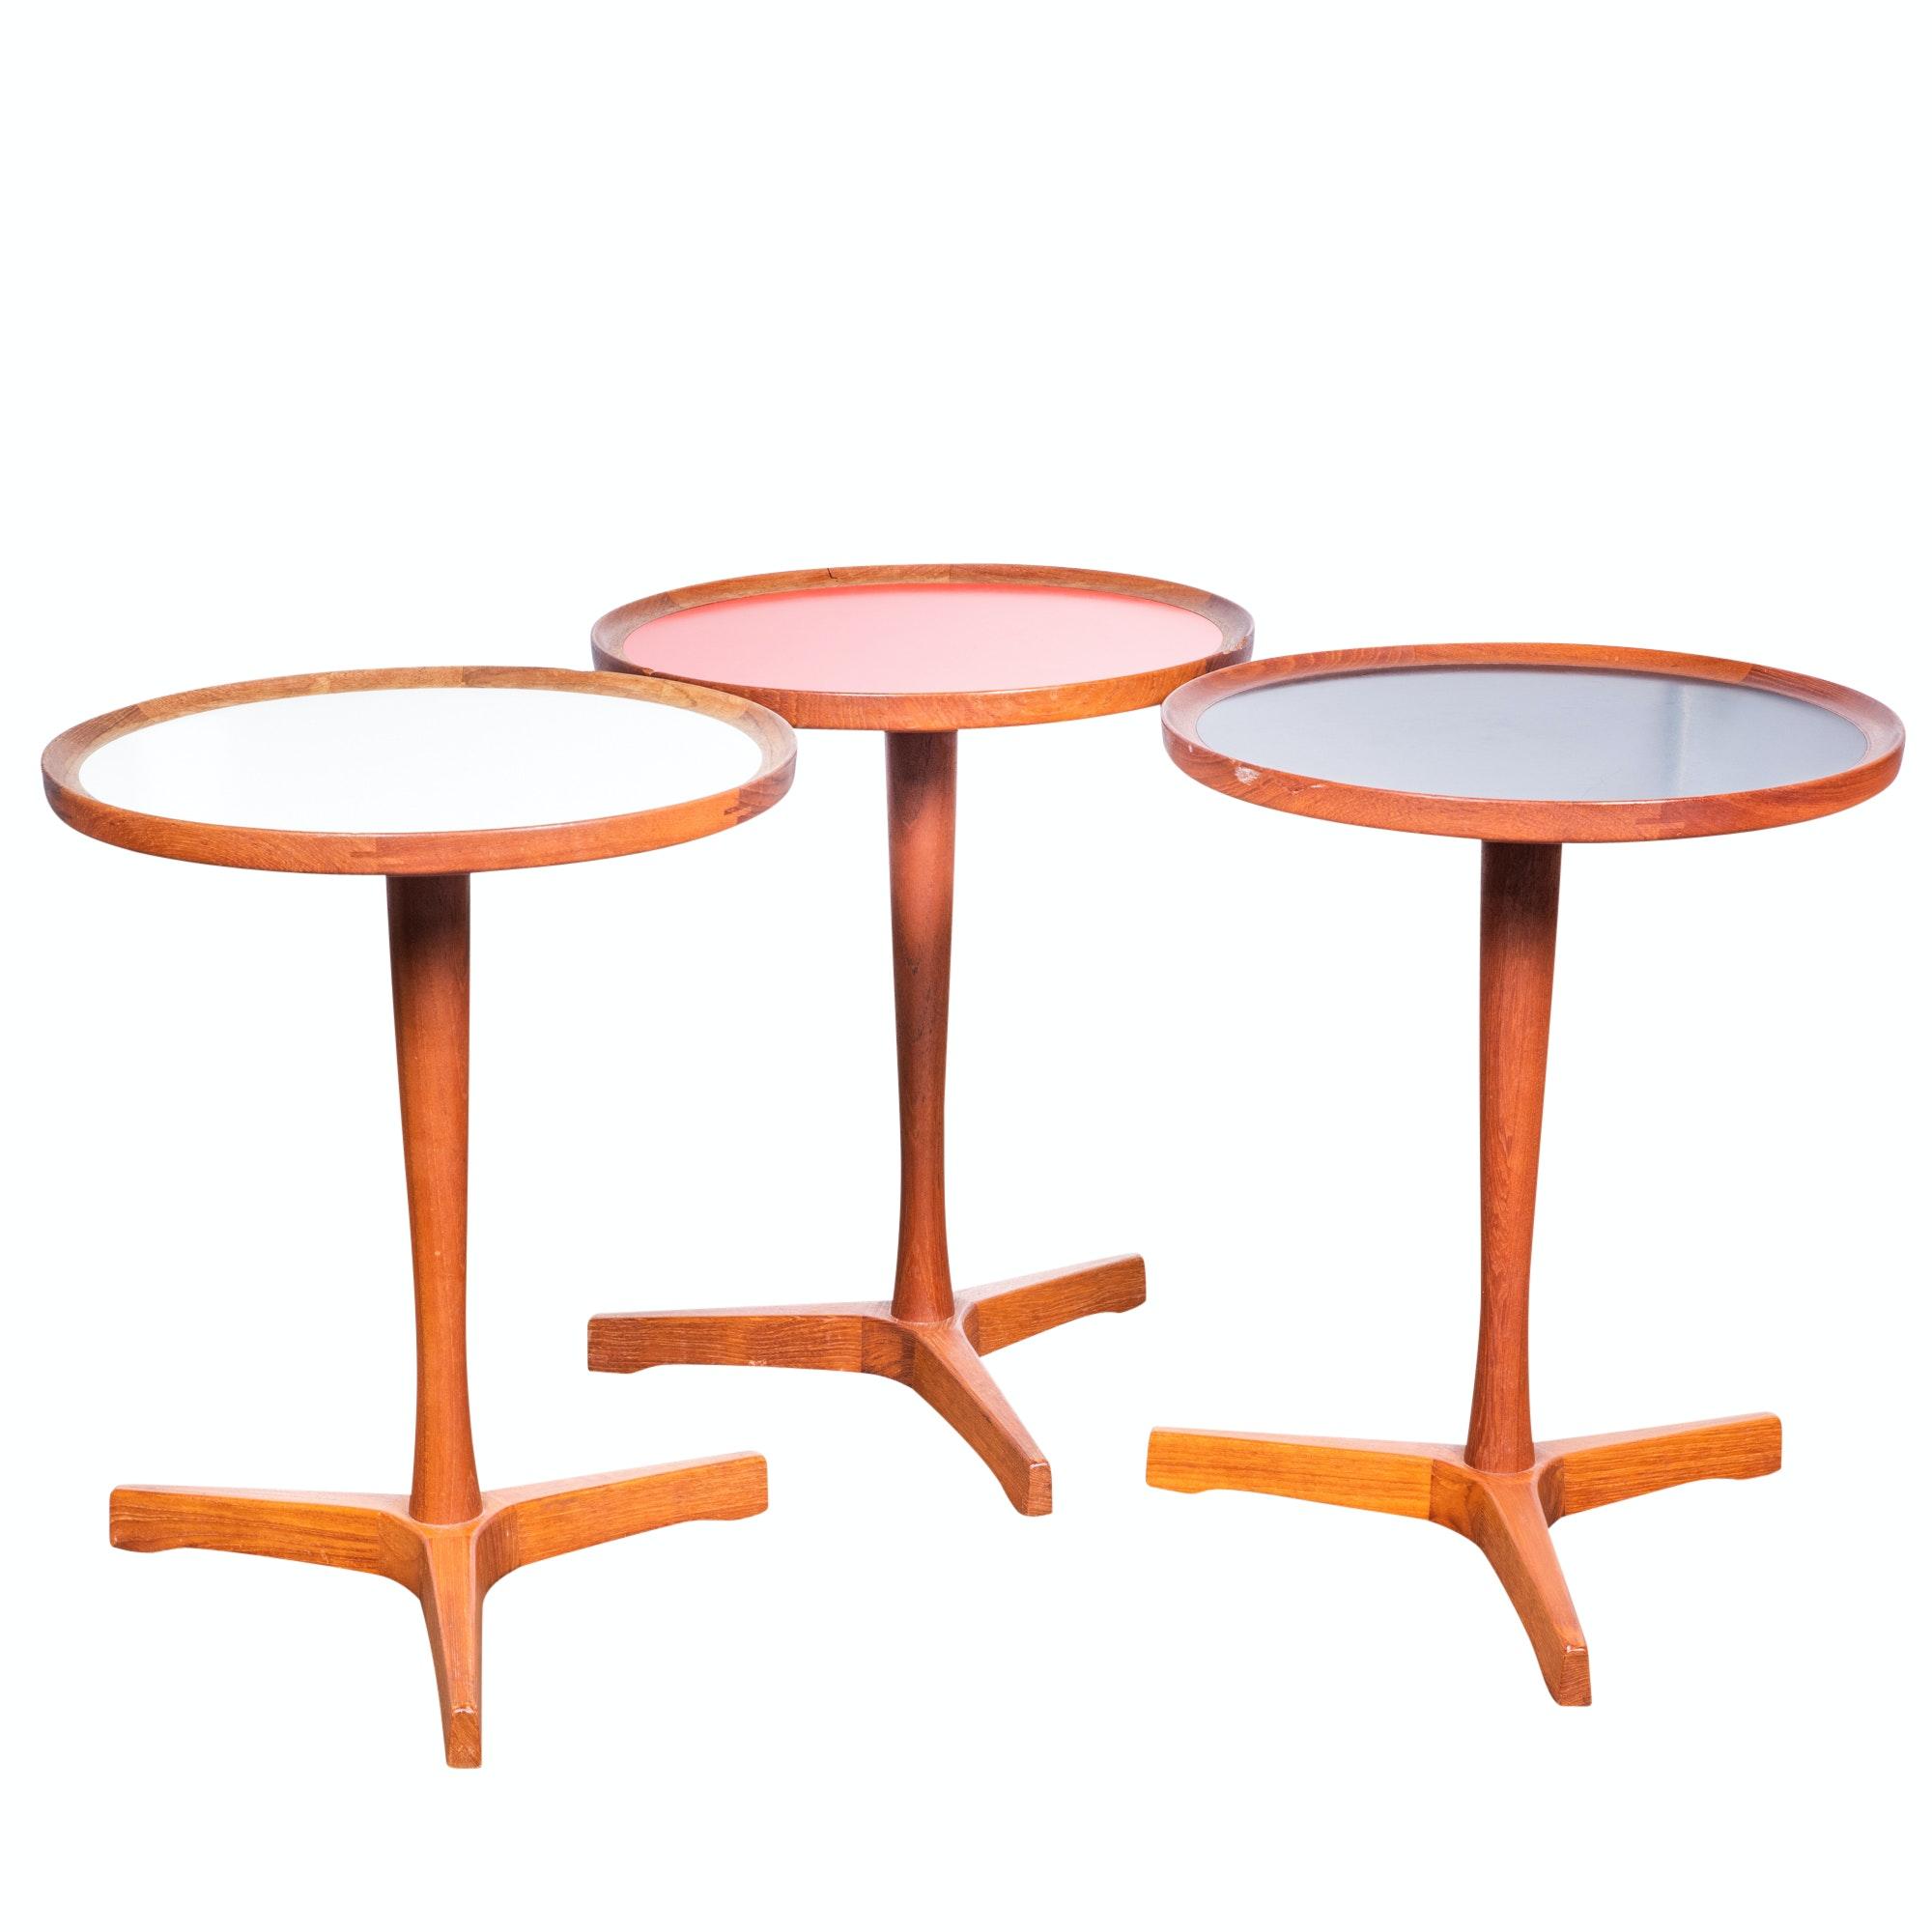 Danish Modern Teak Side Table Set by Hans C. Andersen, Mid-20th Century